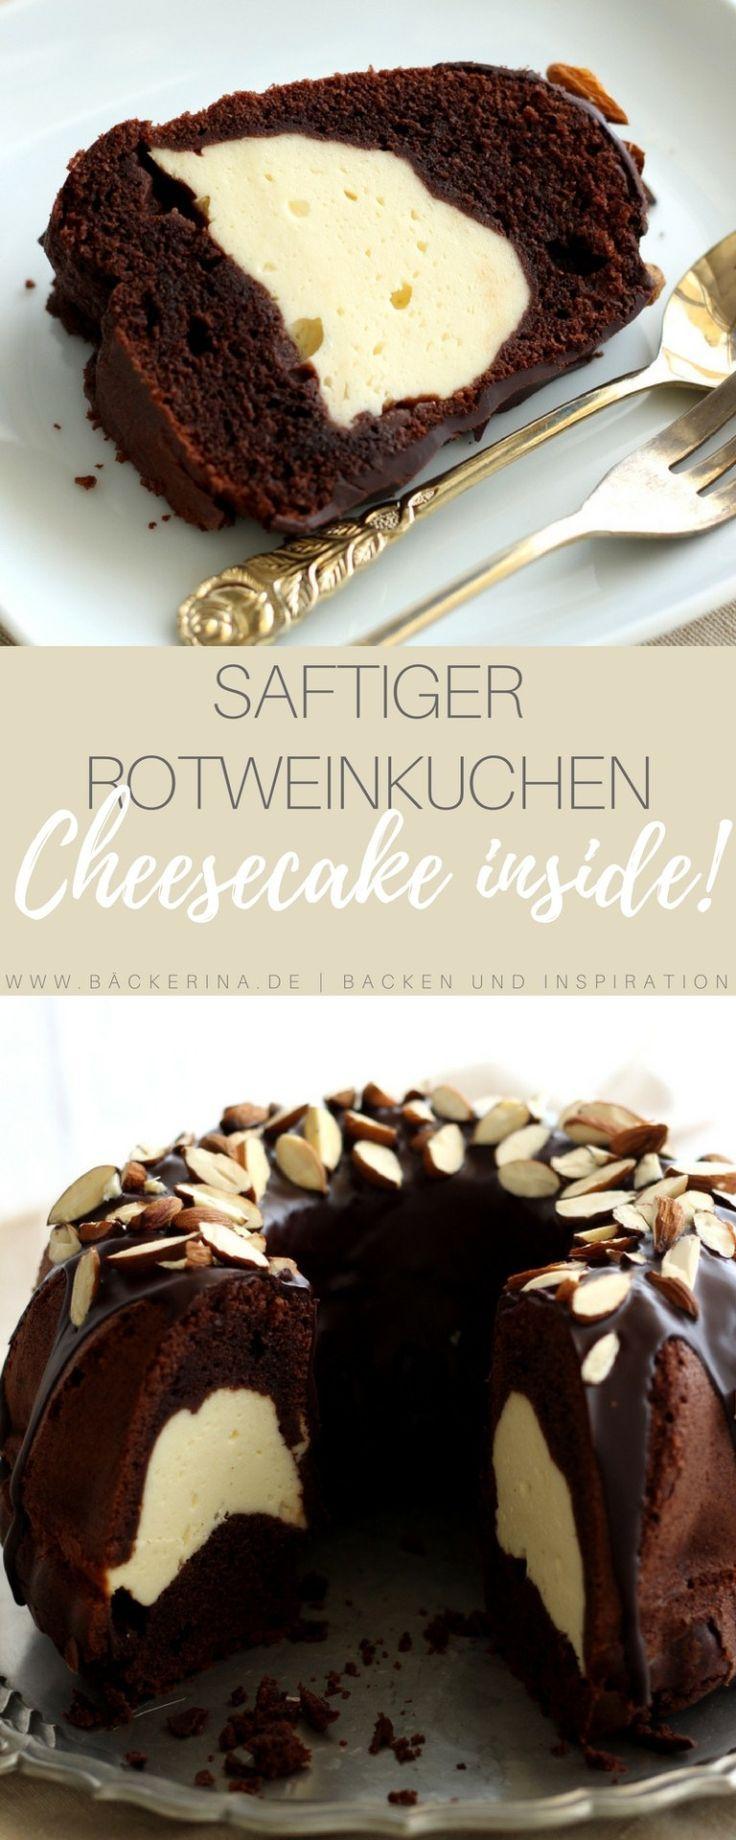 Rotweinkuchen mit Cheesecake-Swirl – #Cheesecake #rotweinkuchen #swirl – #new de5f5f9fd368eb003d21d8652f8408d9